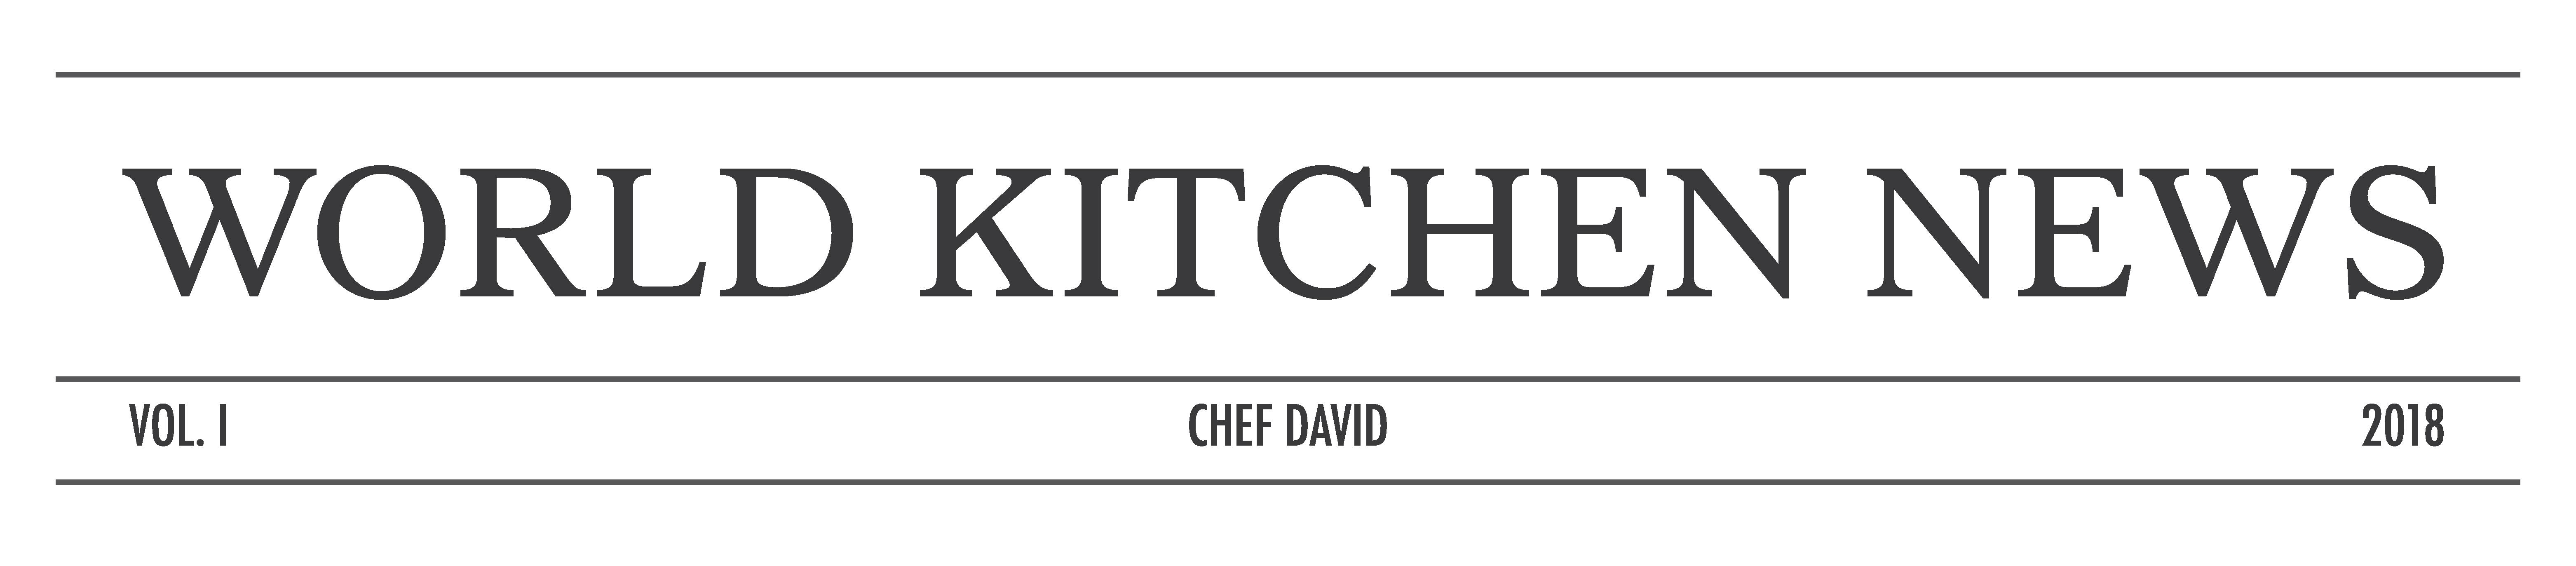 saigon hoisin sauce Archives | World Kitchen - Private Chef Services ...